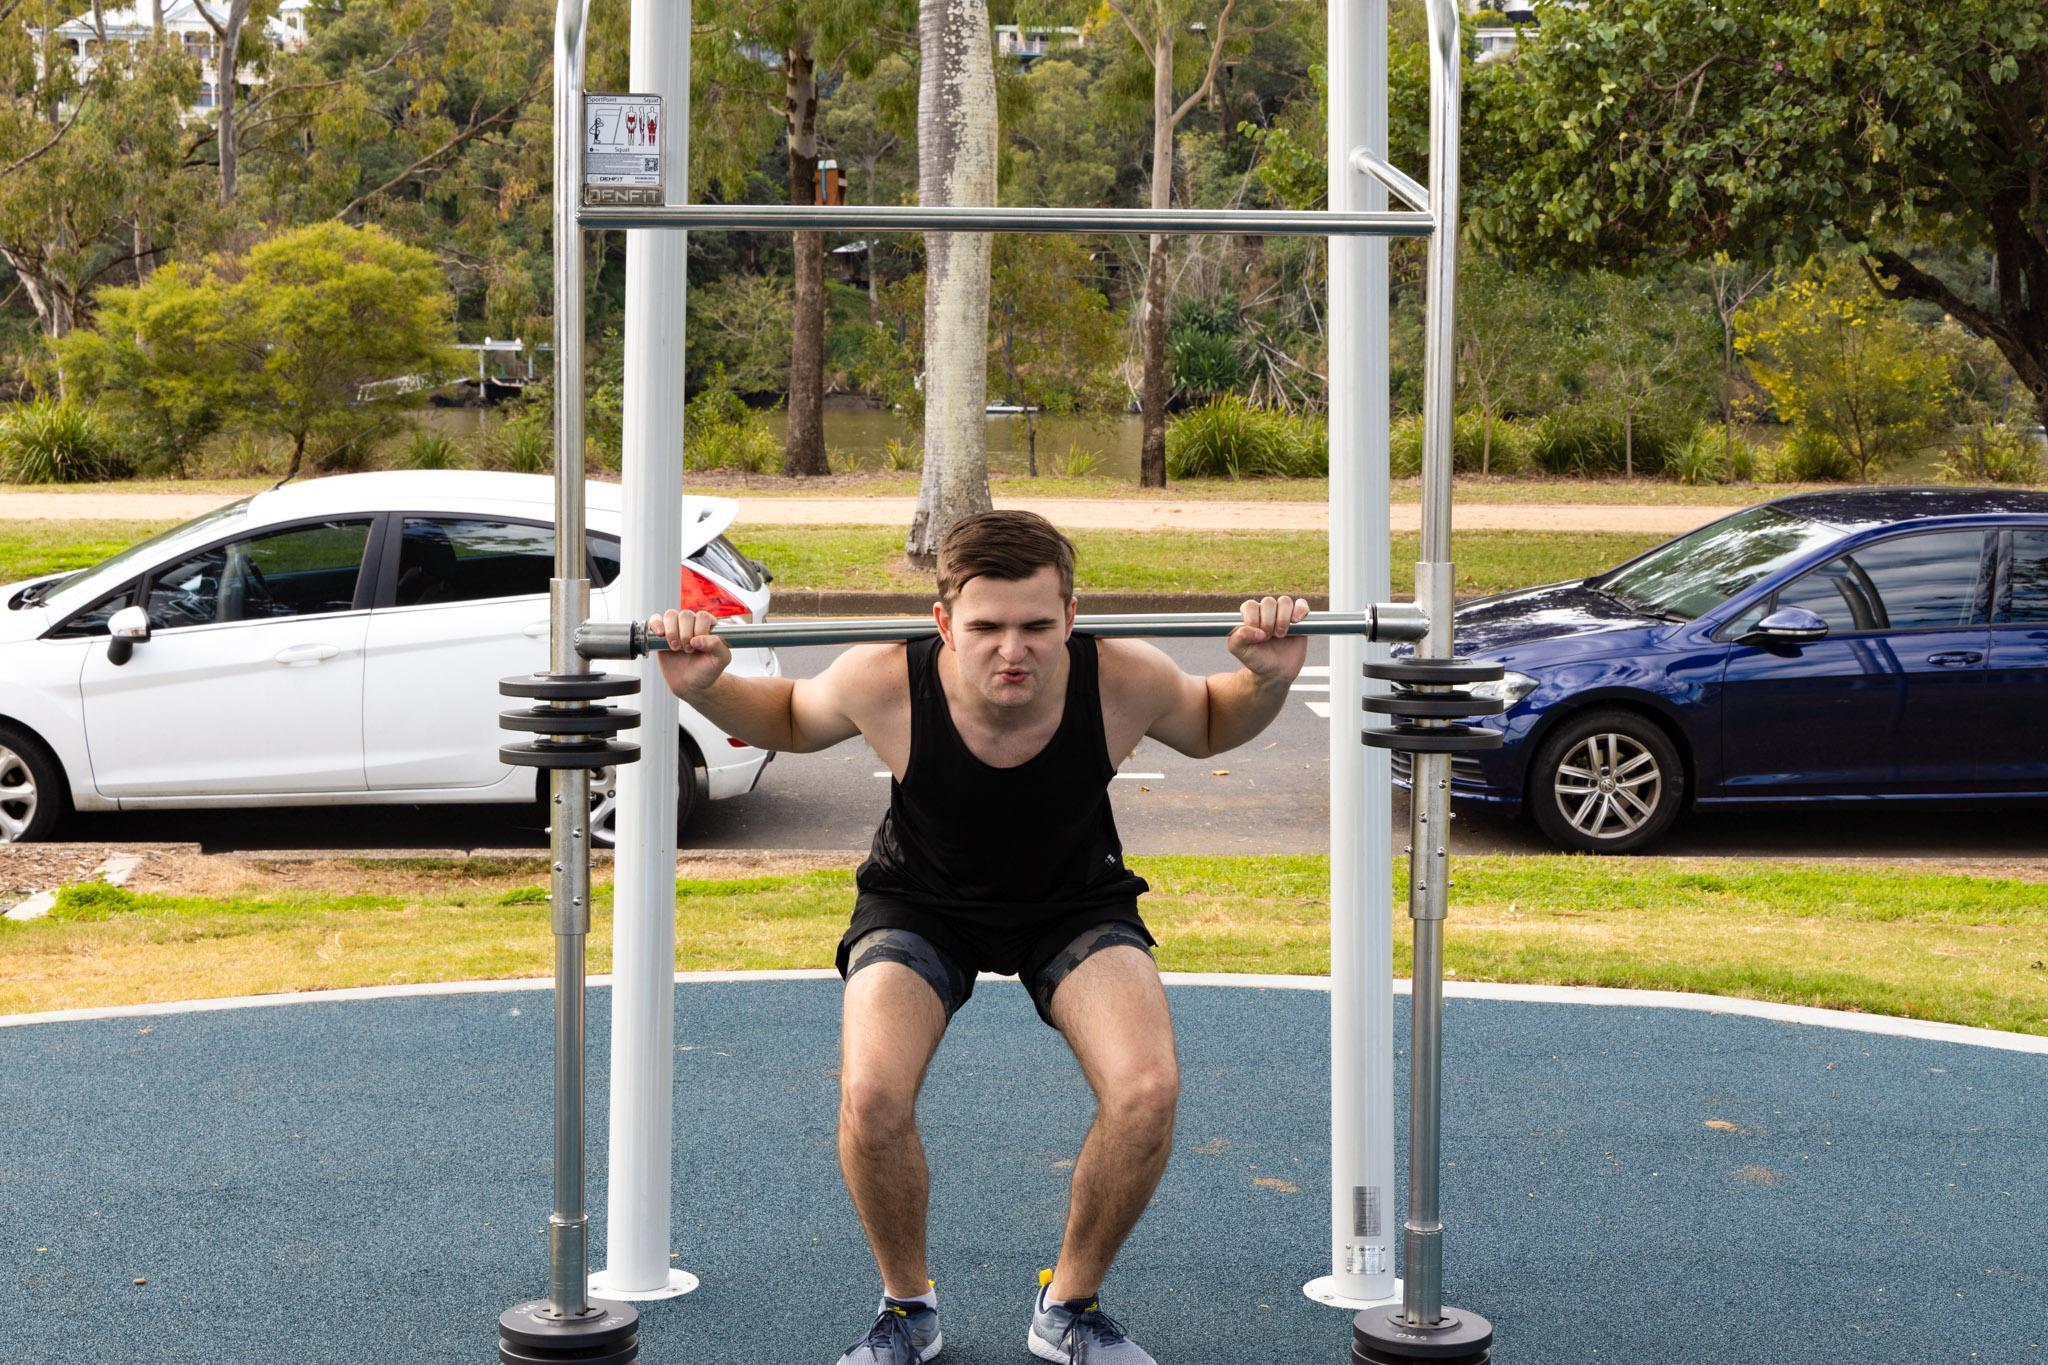 uq-outdoor-fitness-austek-play-brisbane-18